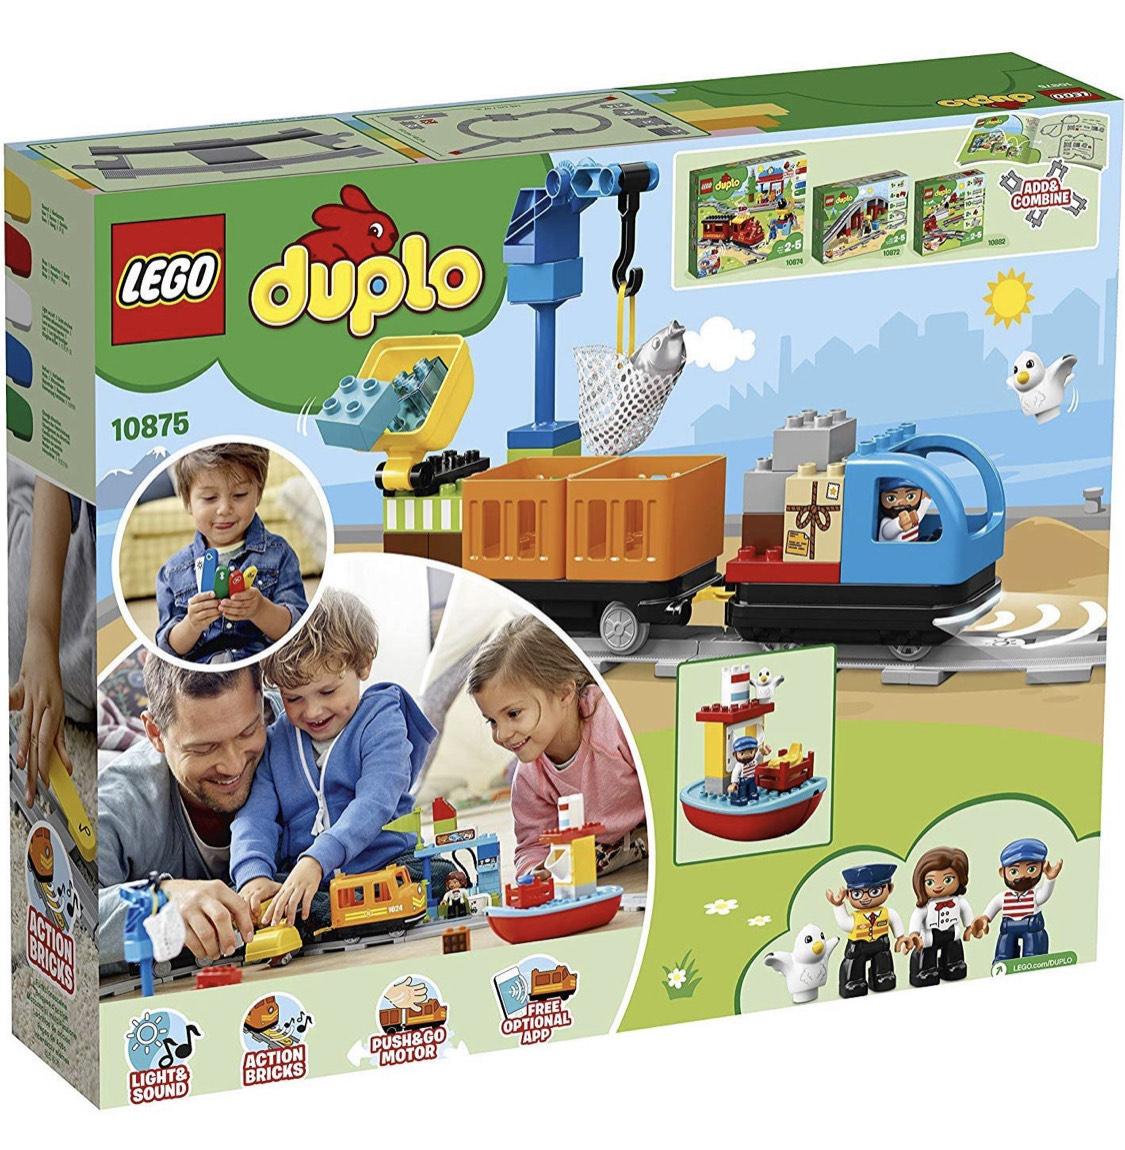 [lego duplo] Cargo Train (10875) [amazon.fr]